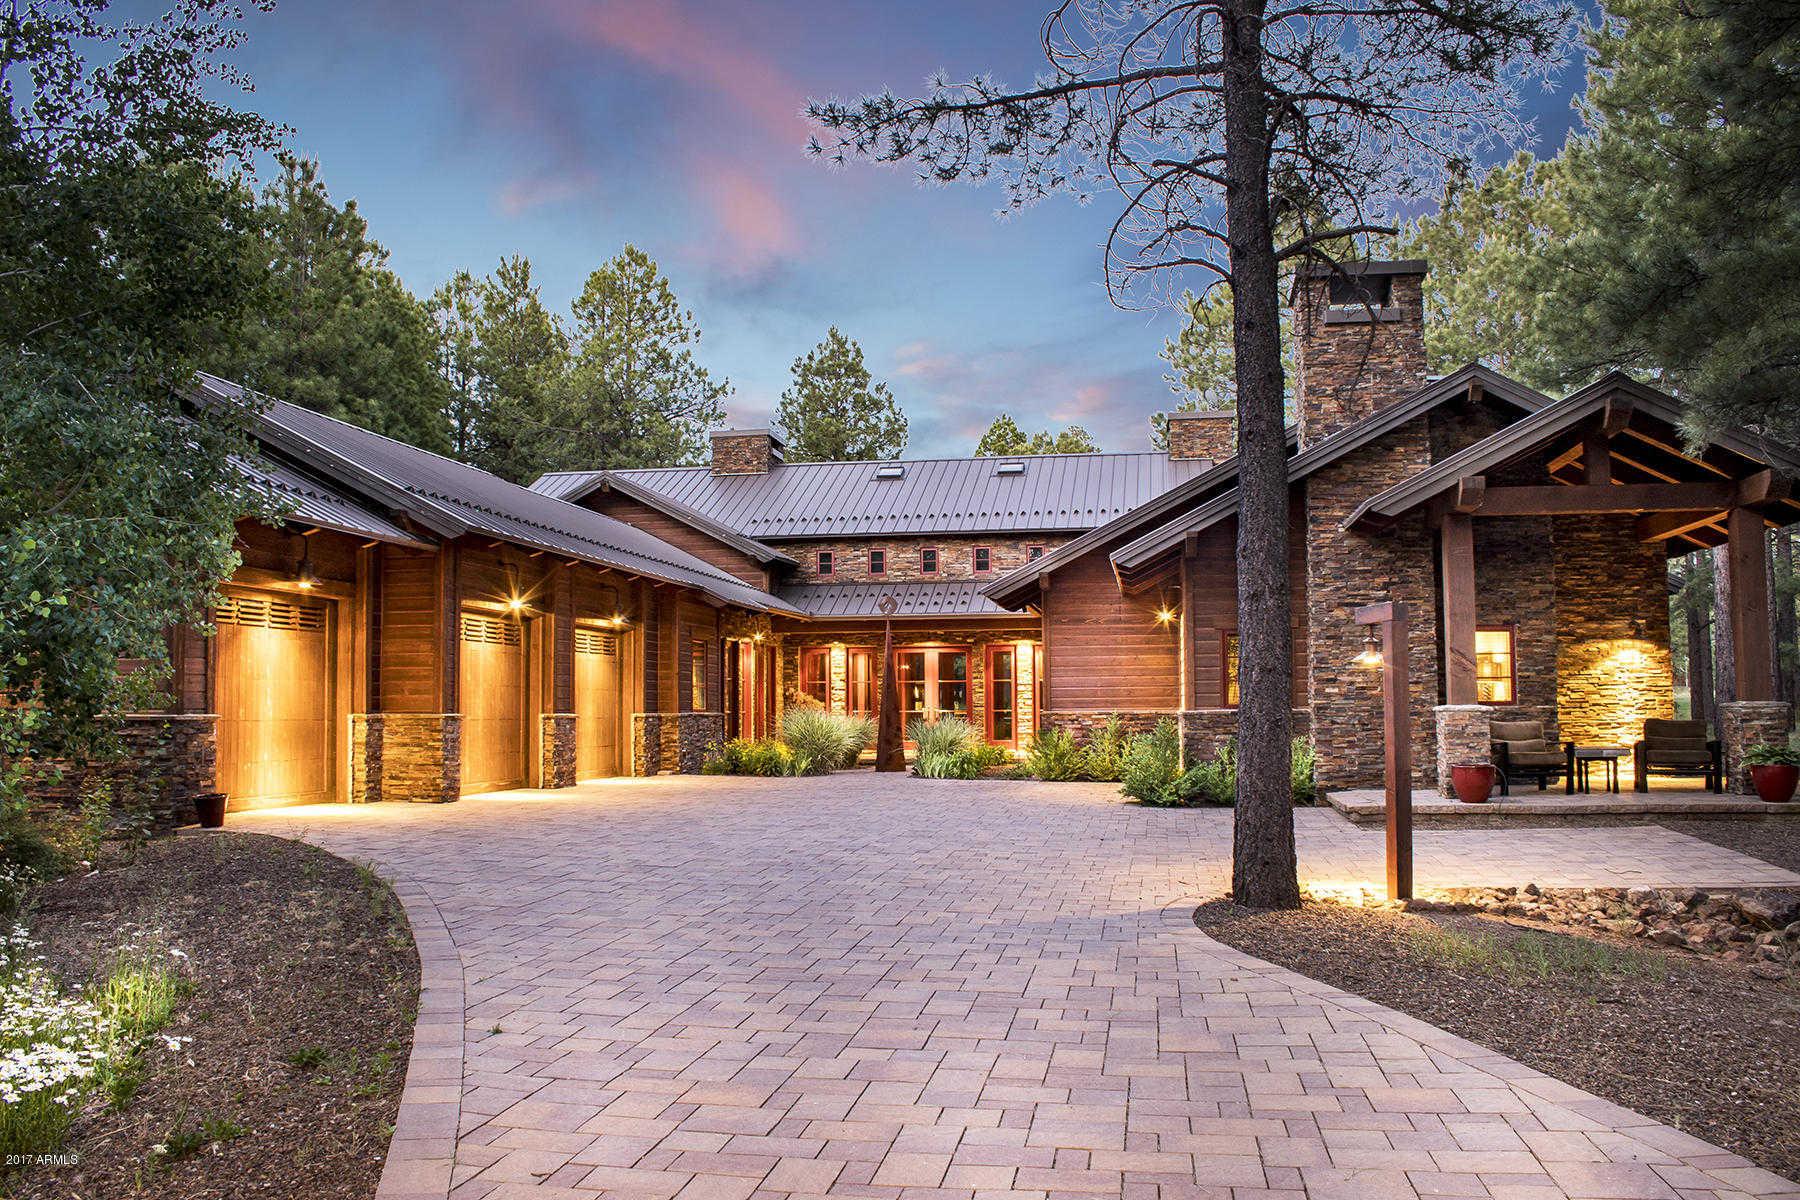 $1,950,000 - 3Br/4Ba - Home for Sale in Forest Highlands, Flagstaff